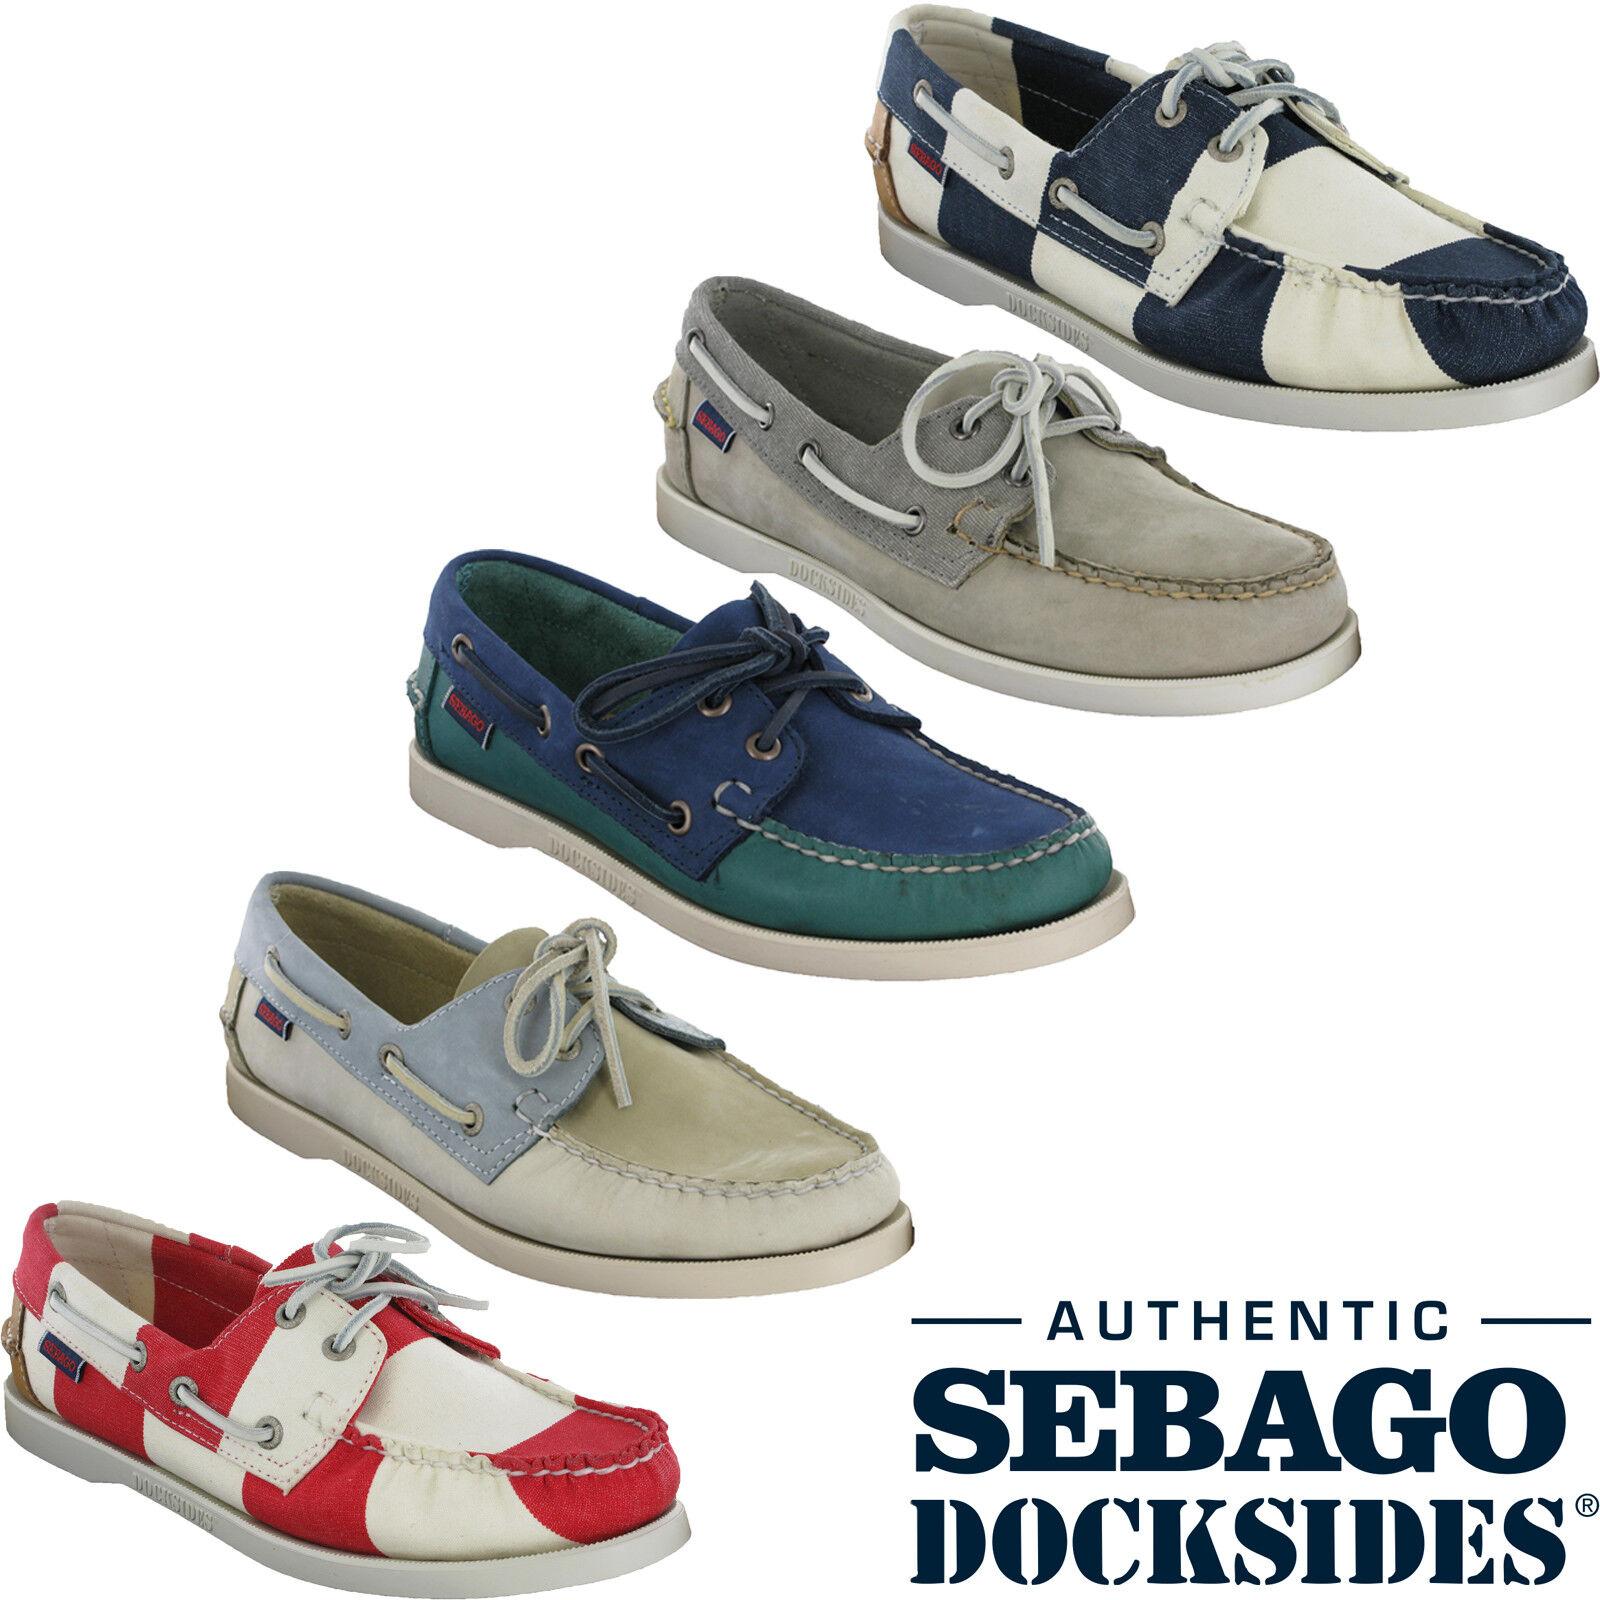 Sebago Spinnaker Docksides da women Barca Casual shoes Stringate Brogue Basse